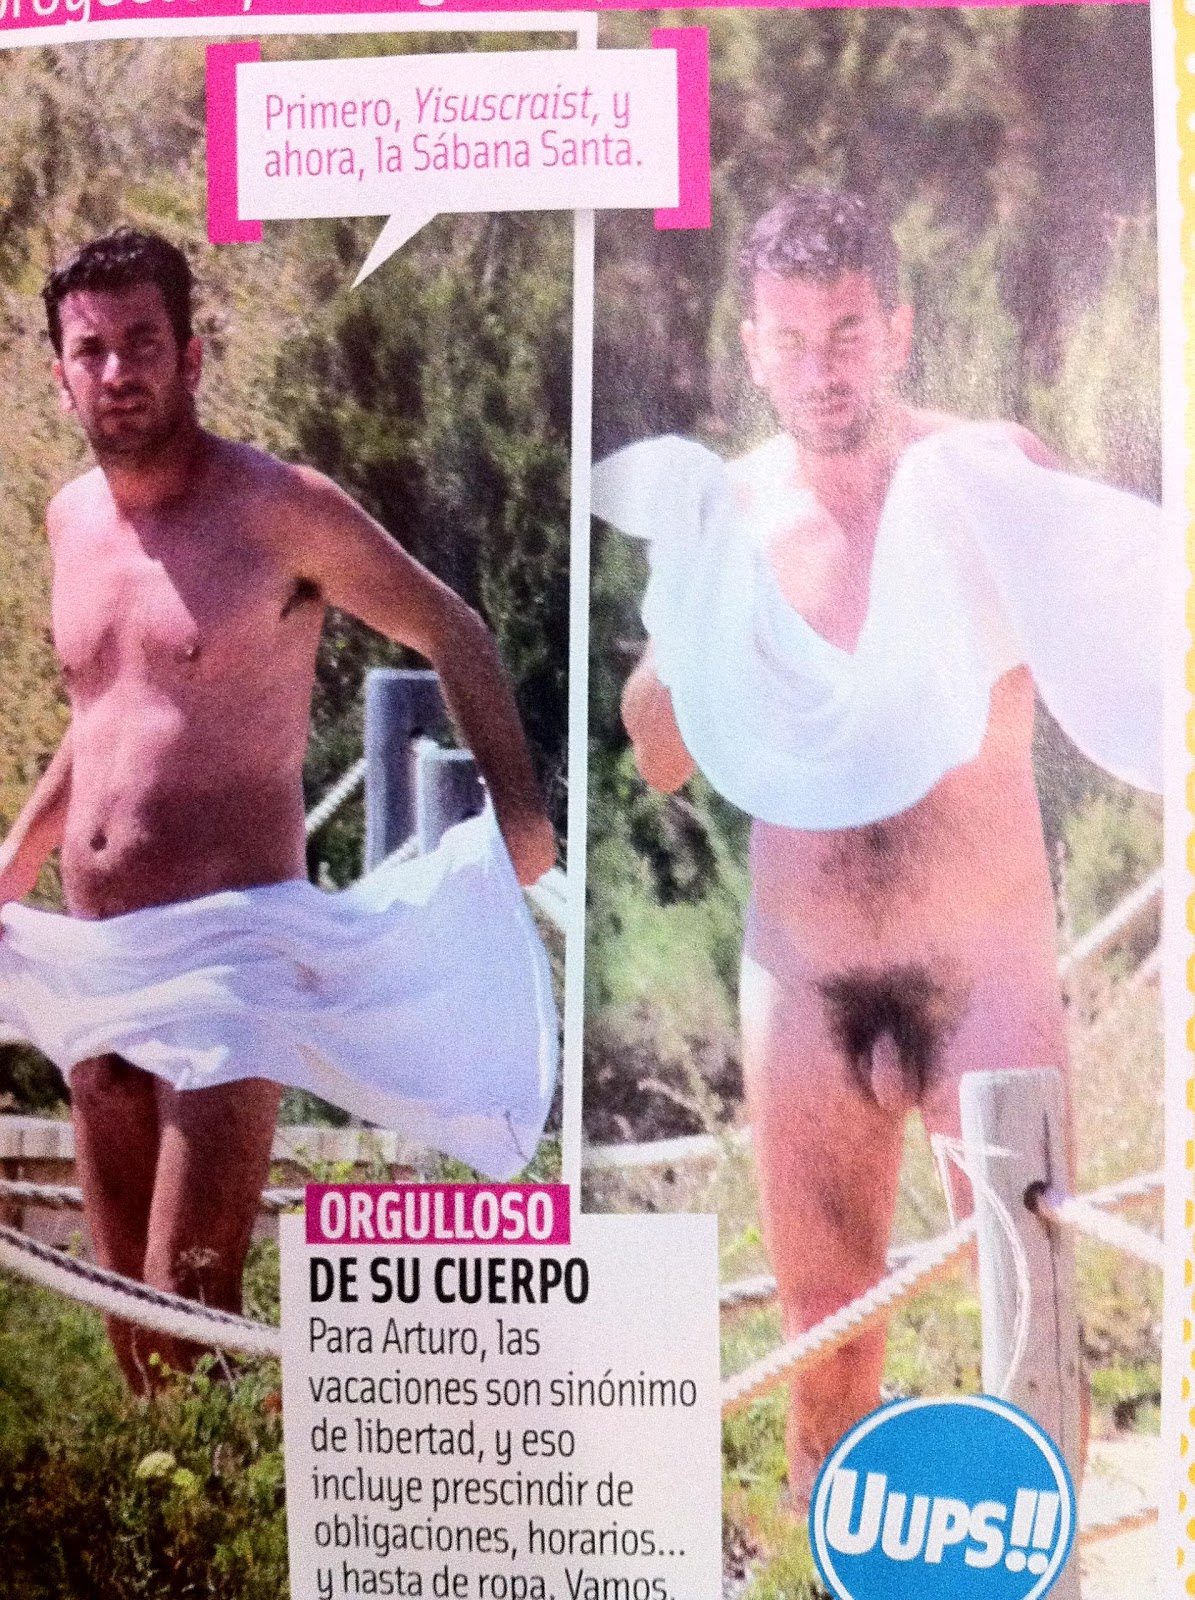 Alessandro Lequio Porn alessandro lequio naked - porno photo